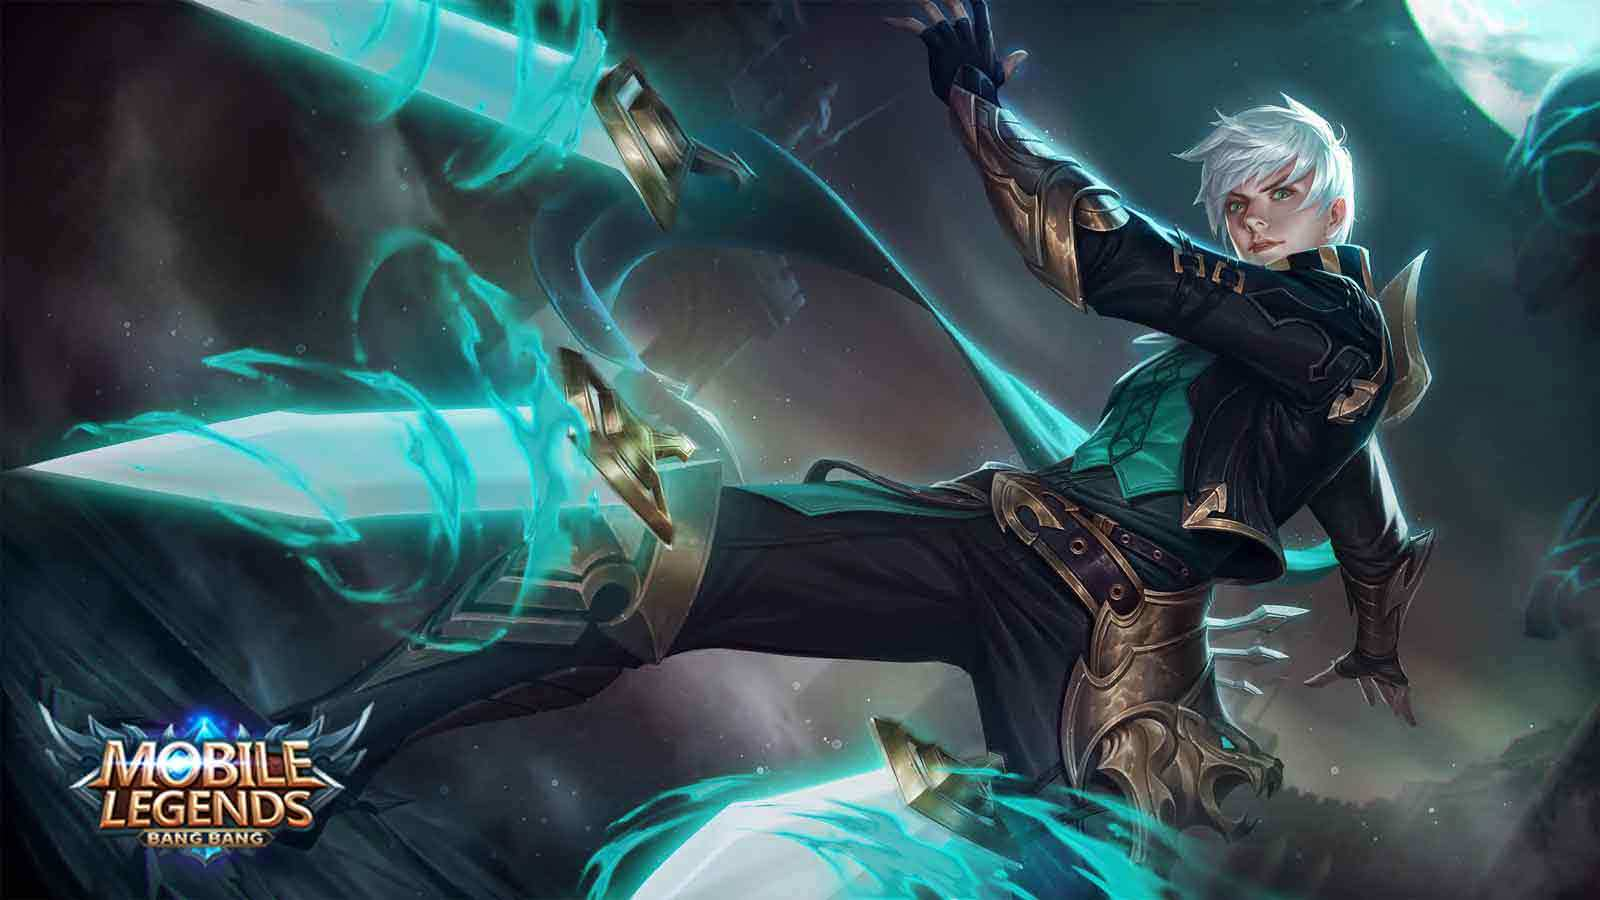 Alucard Child Of The Fall Wallpaper Hd Hero Gossen Gusion Wallpapers 2018 Mobile Legends